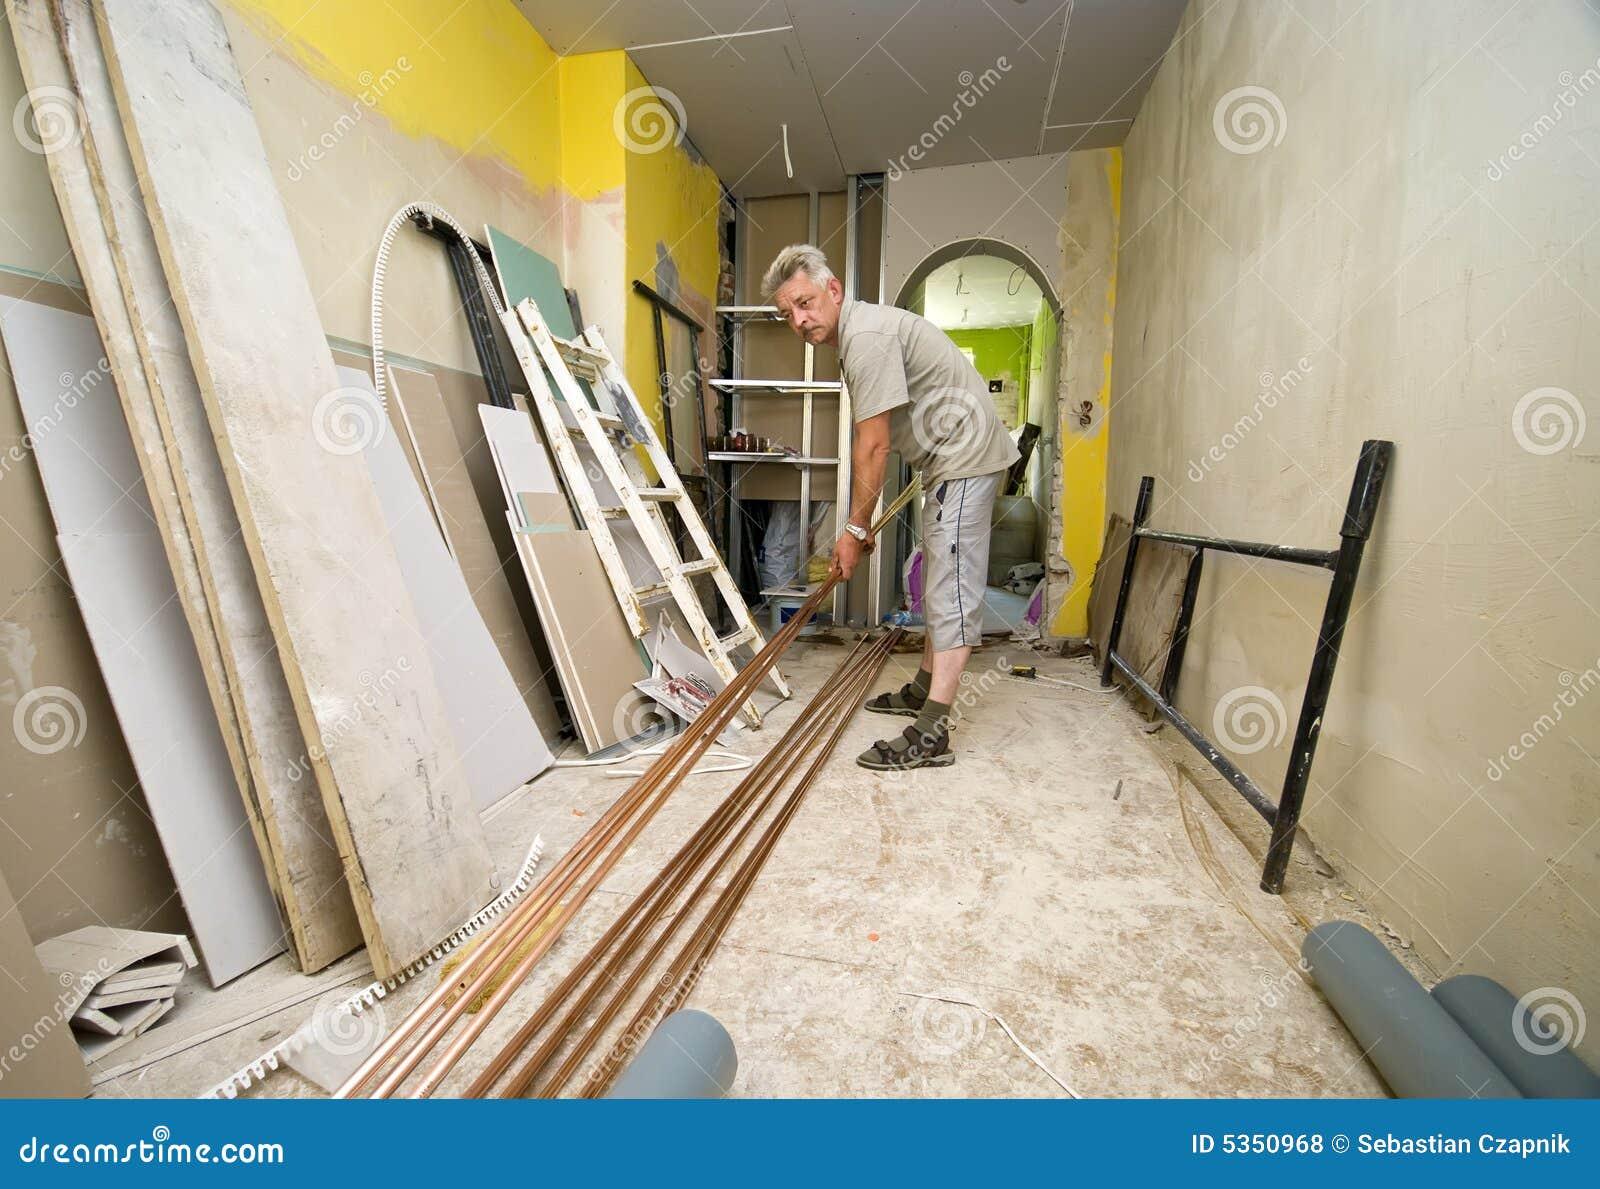 home renovation royalty free stock photos image 5350968